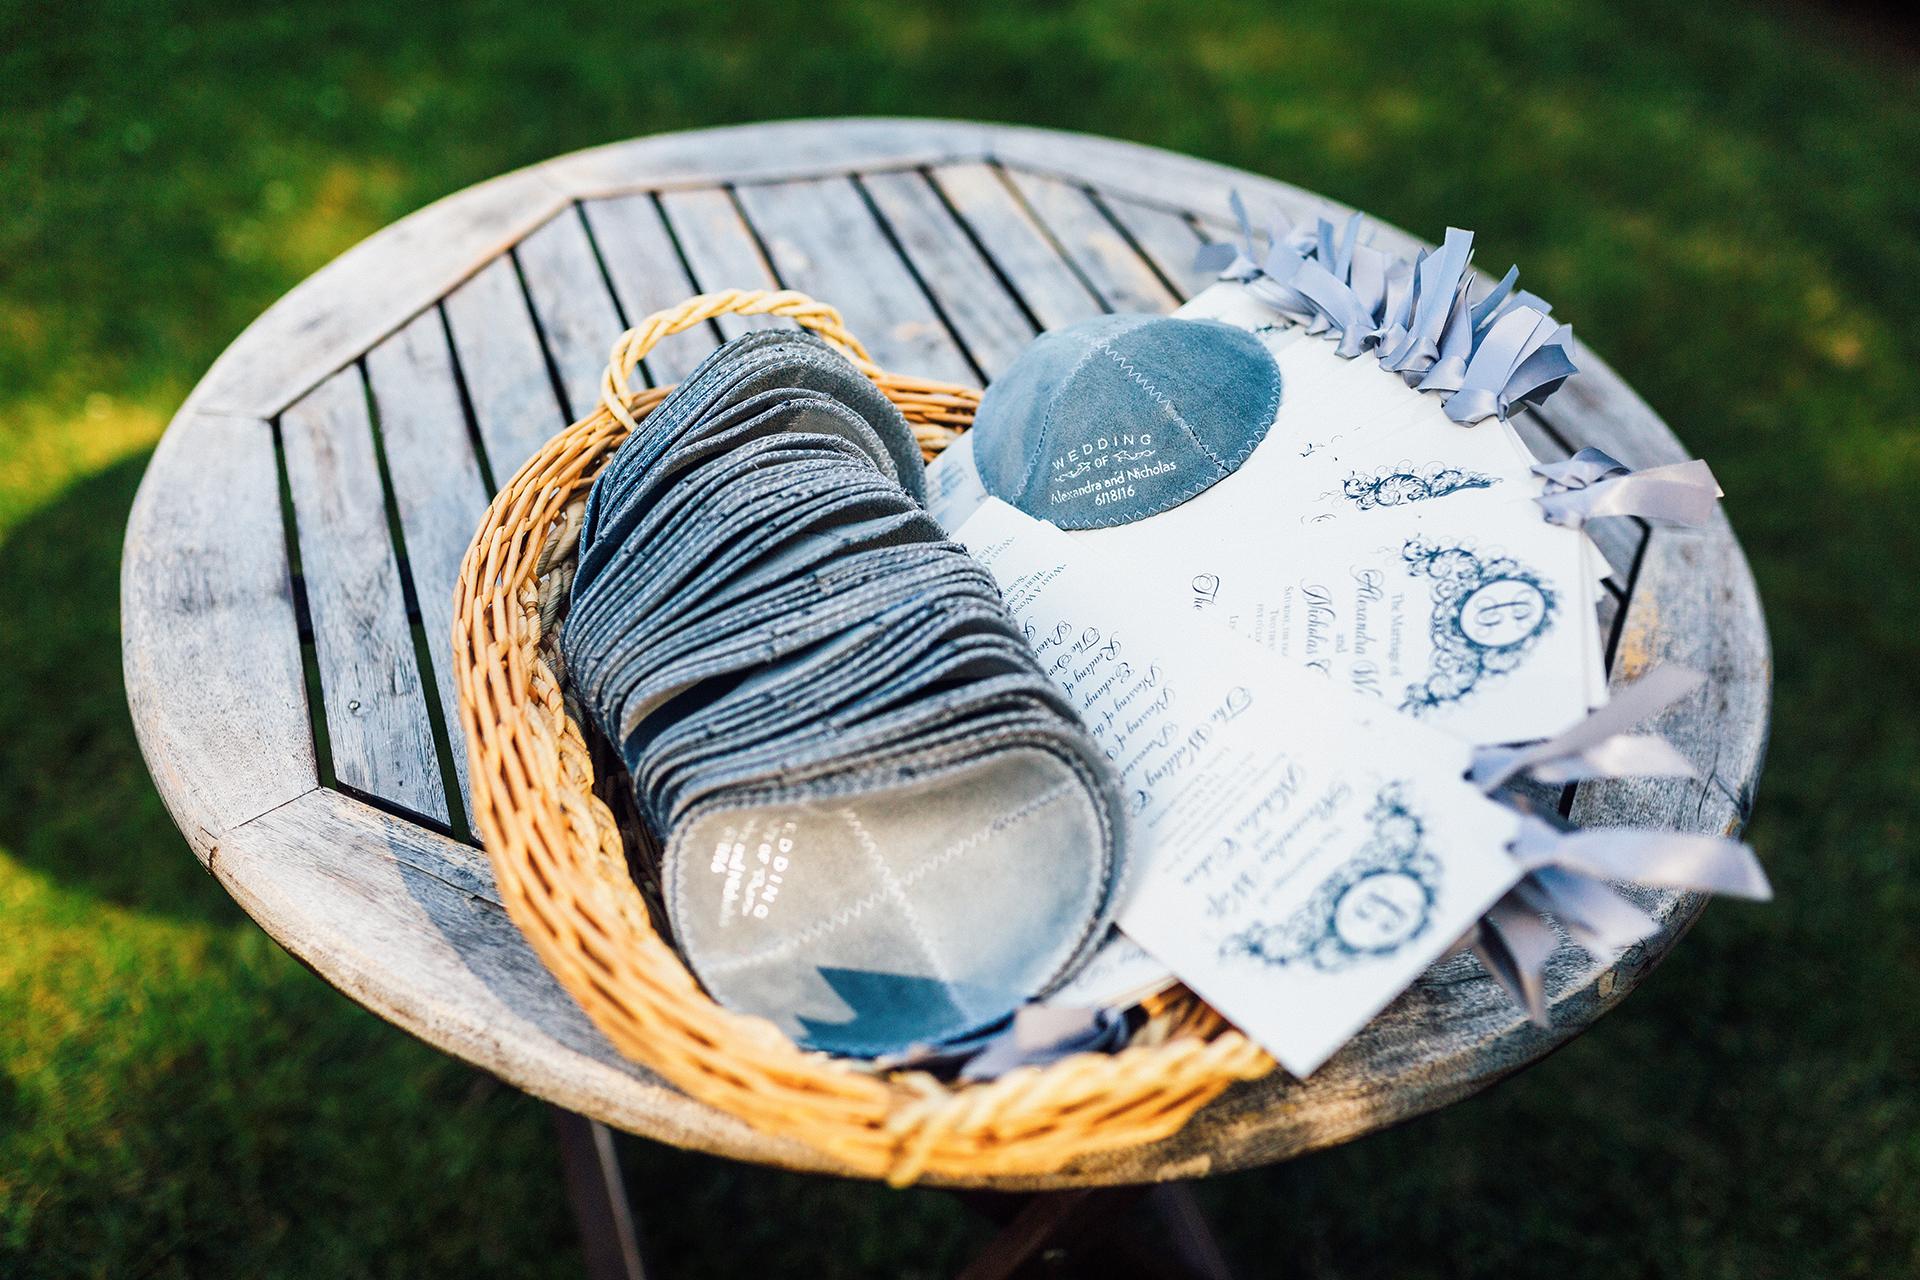 blue yarmulkes matching programs on wood table